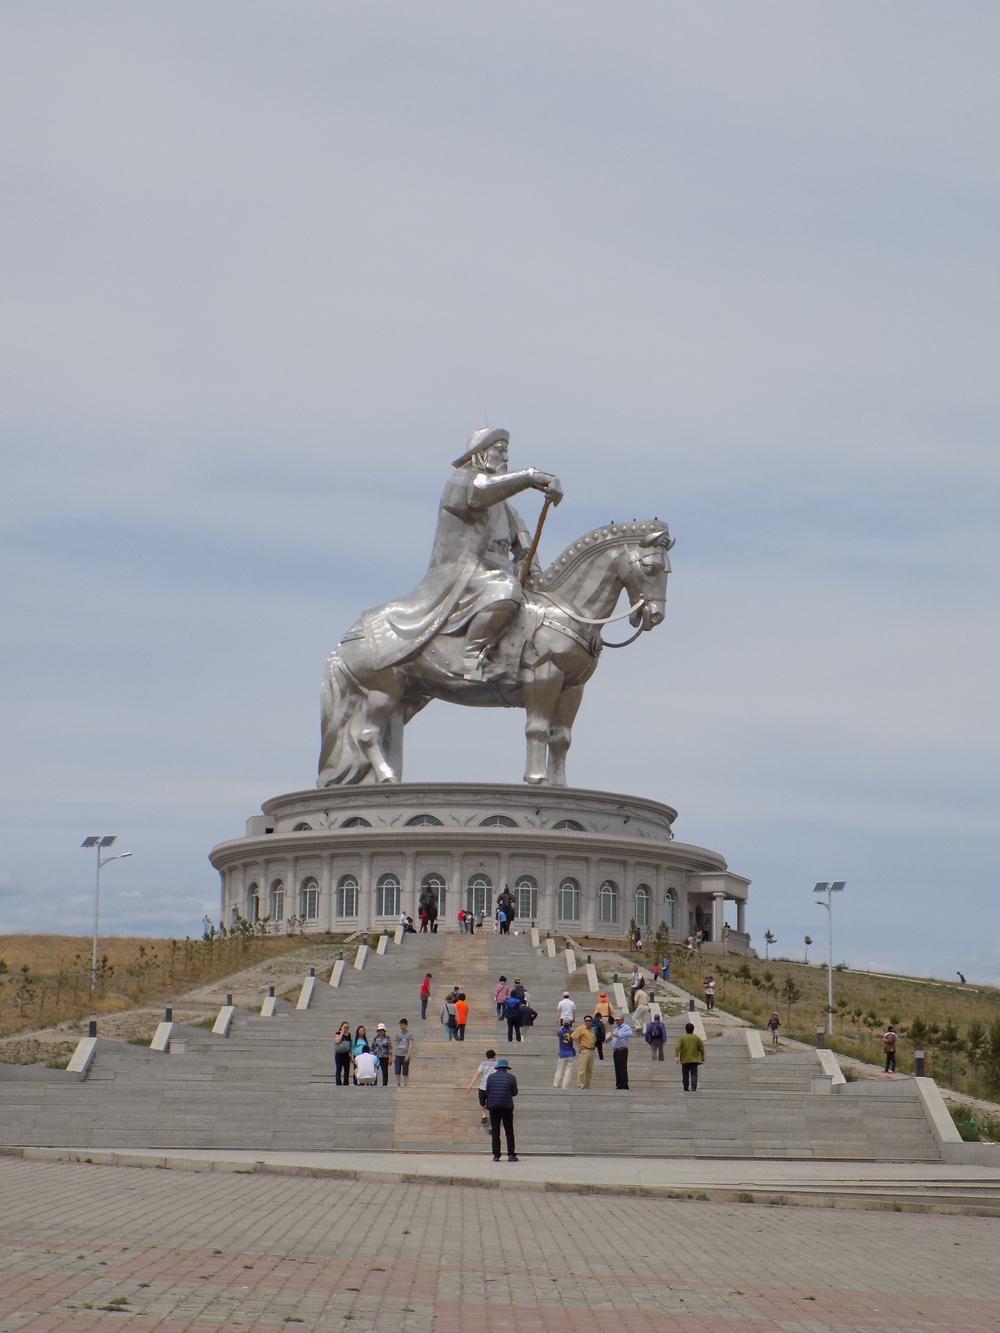 Genghis Khan Equestrian Monument